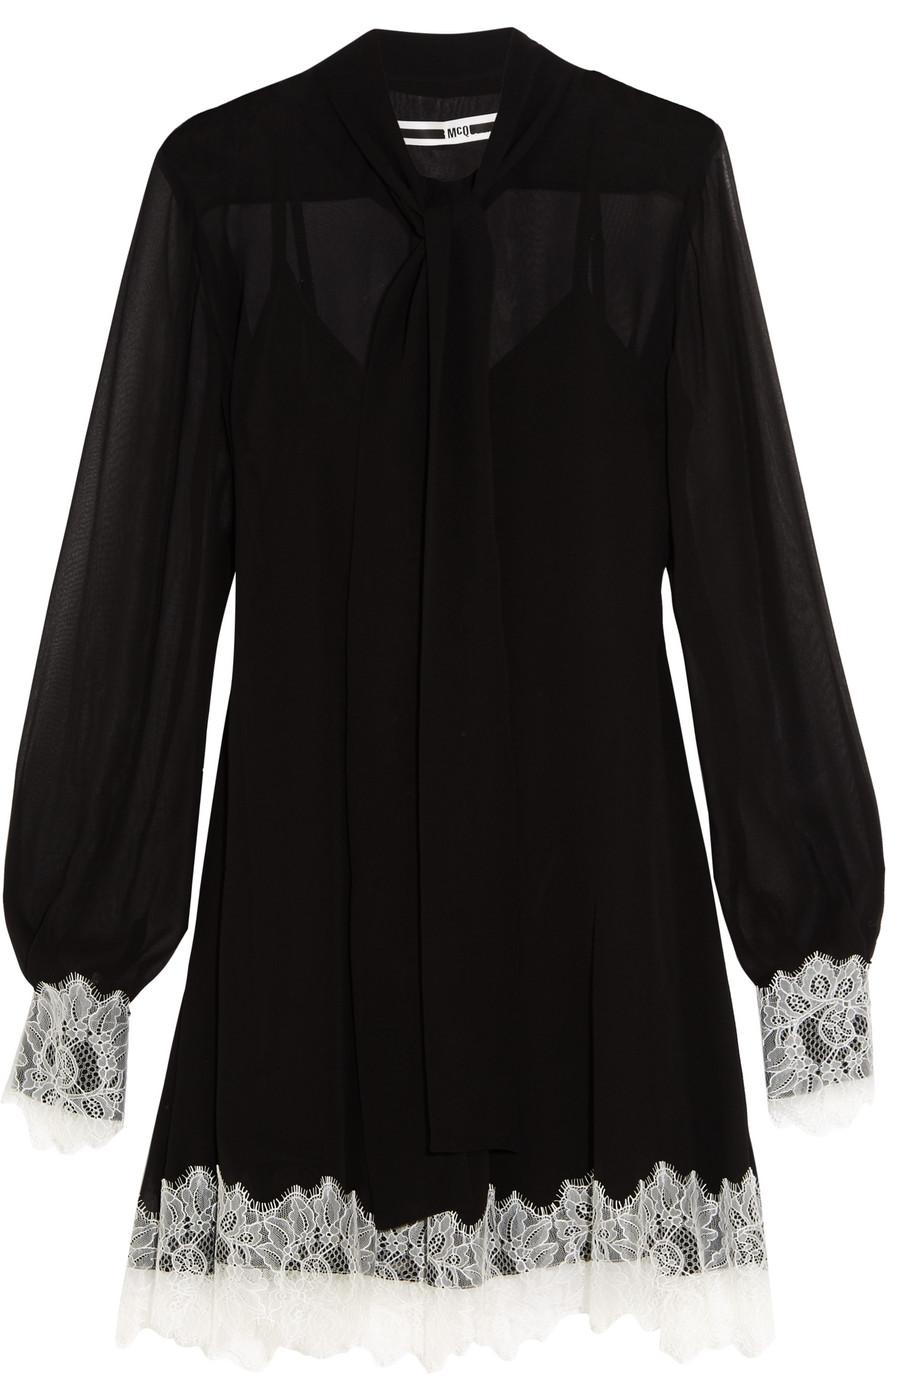 Pussy-Bow Lace-Trimmed Silk-Chiffon Mini Dress, Mcq Alexander Mcqueen, Black, Women's, Size: 36